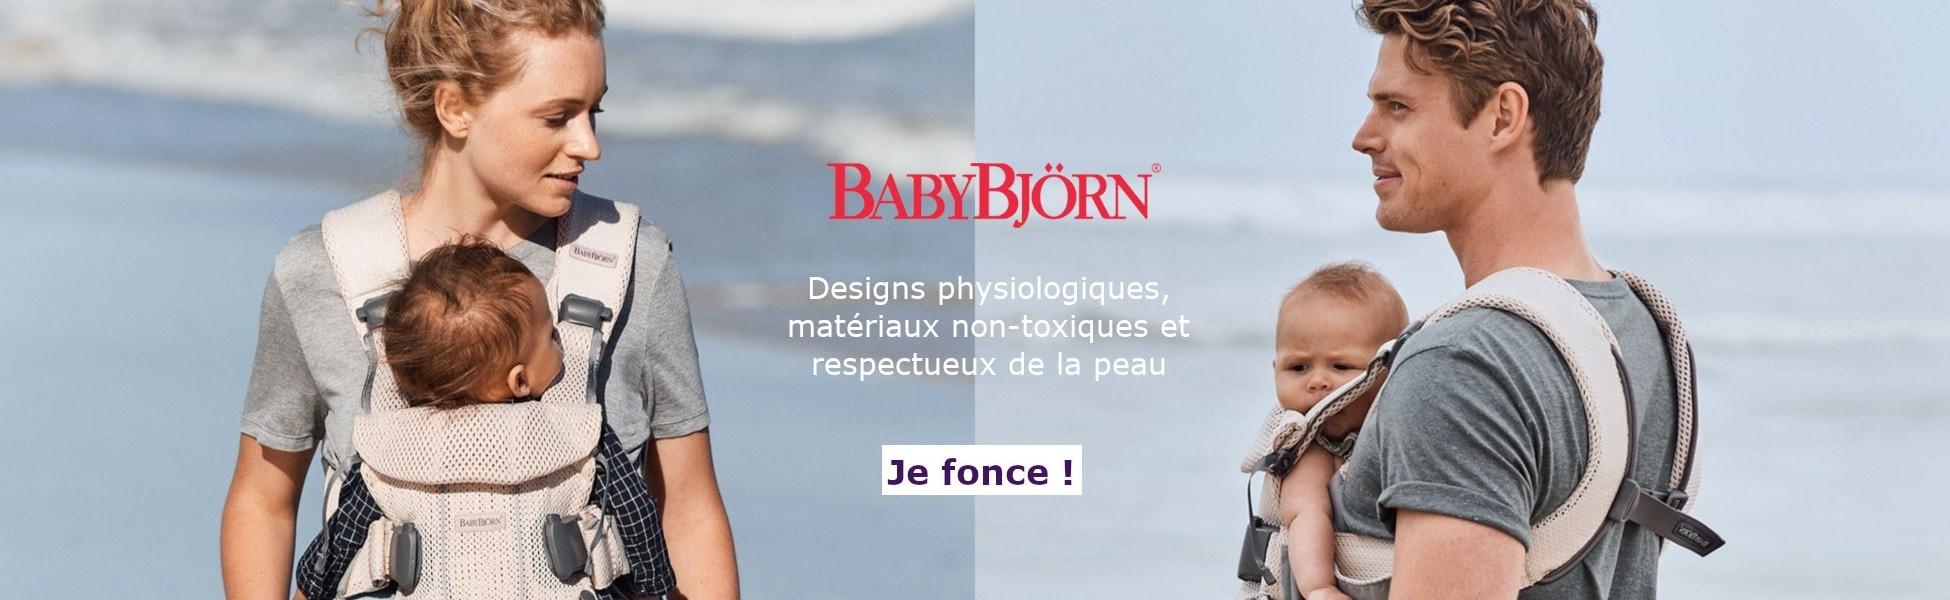 porte-bébé mini one airBabybjorn